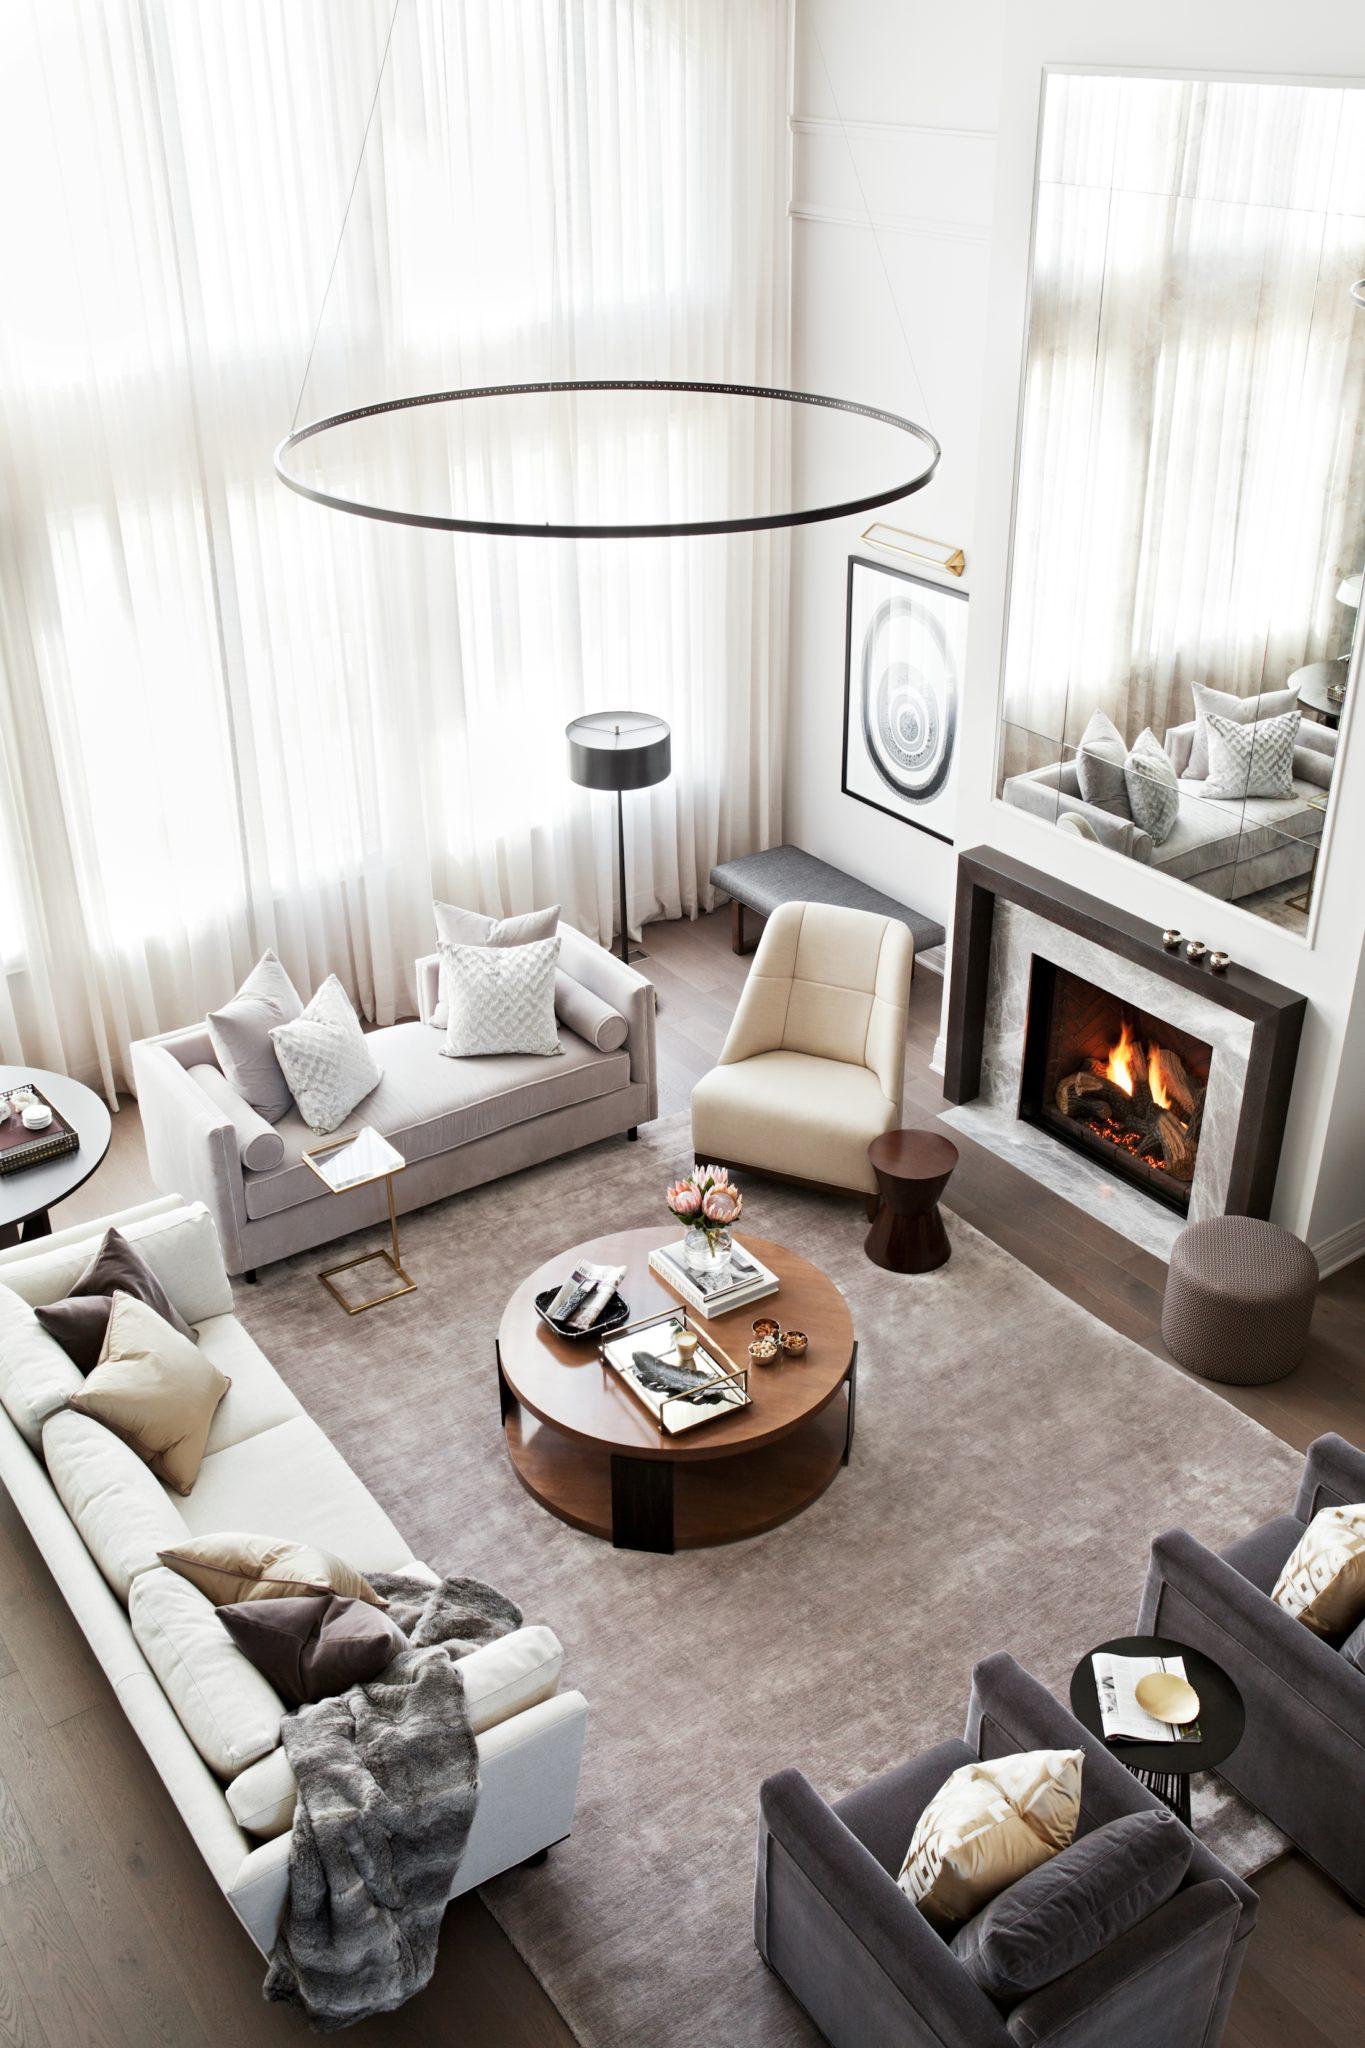 Great Room designed by Elizabeth Metcalfe Interiors & Design Inc. by Elizabeth Metcalfe Interiors & Design Inc.